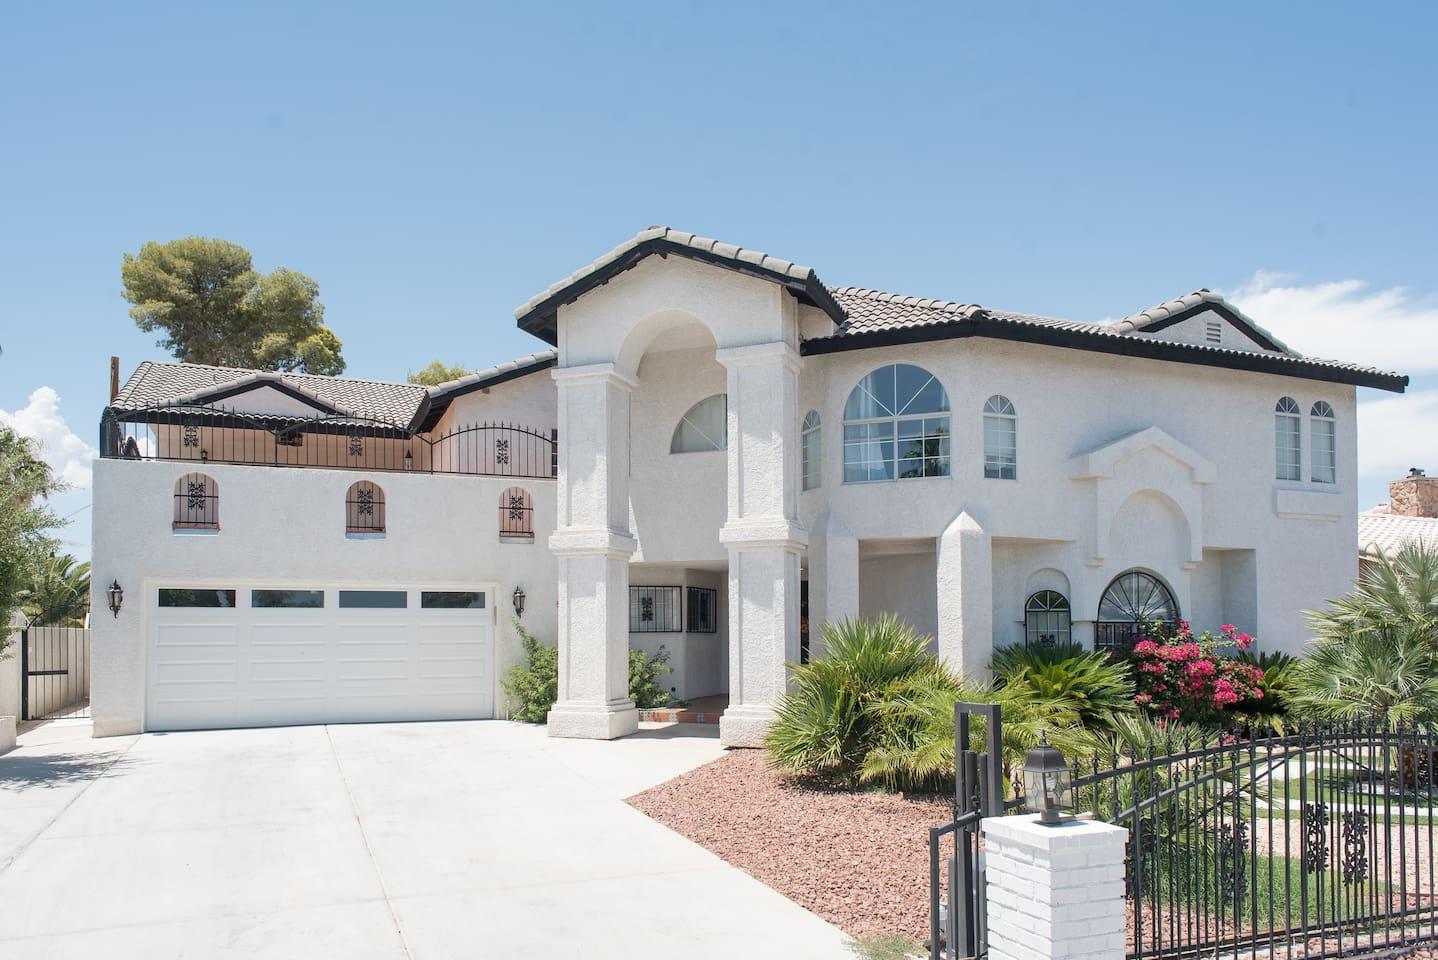 Our favorite Henderson Nevada Airbnb budget vacation rental near Las Vegas